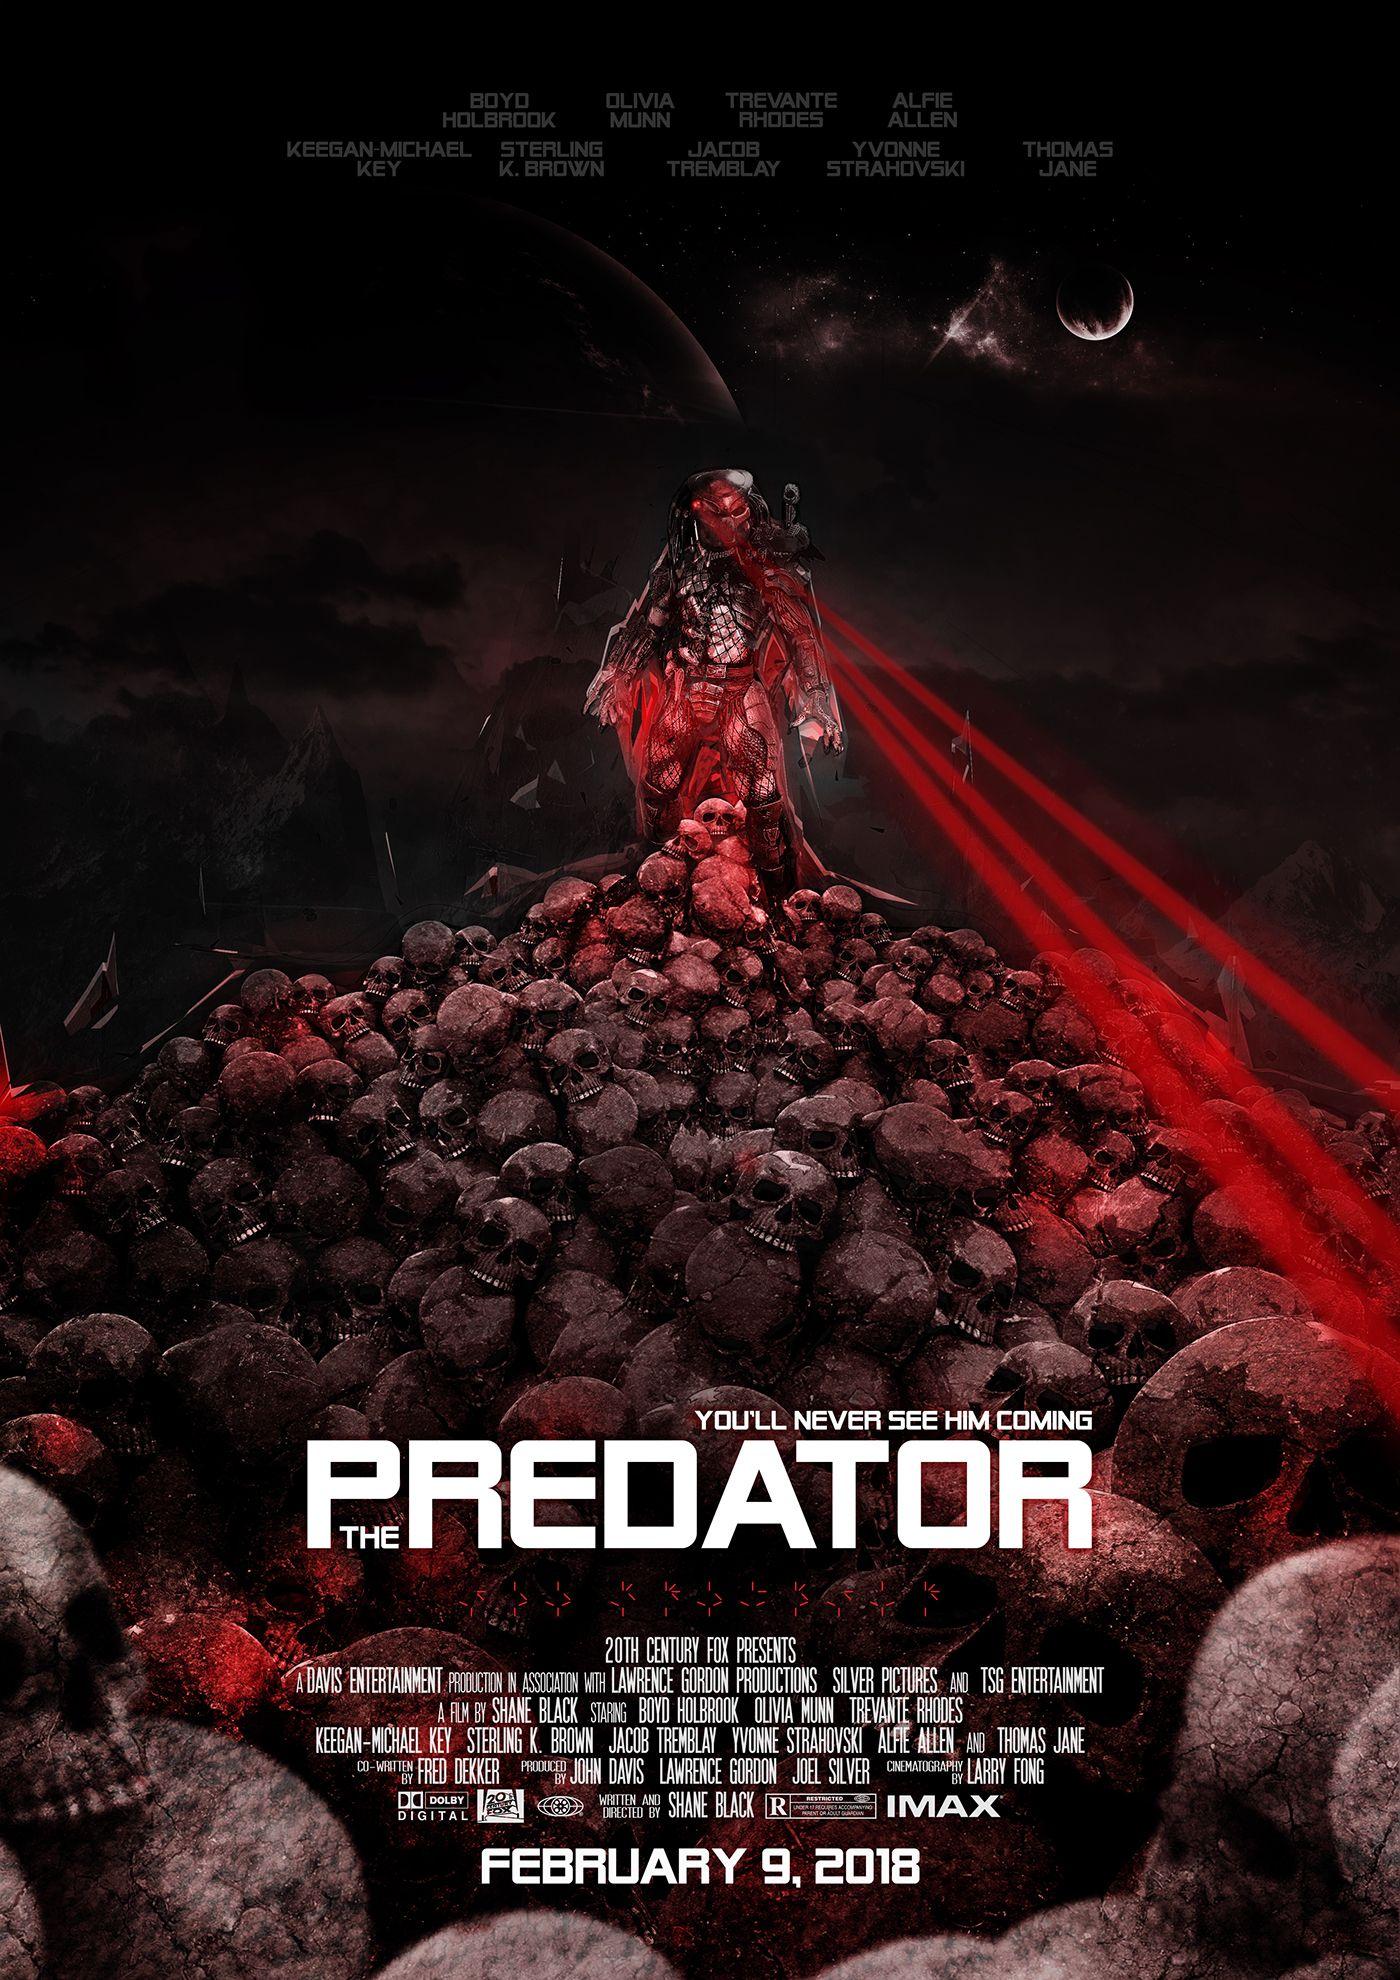 Pin by Johnny Rook on Movies Predator full movie